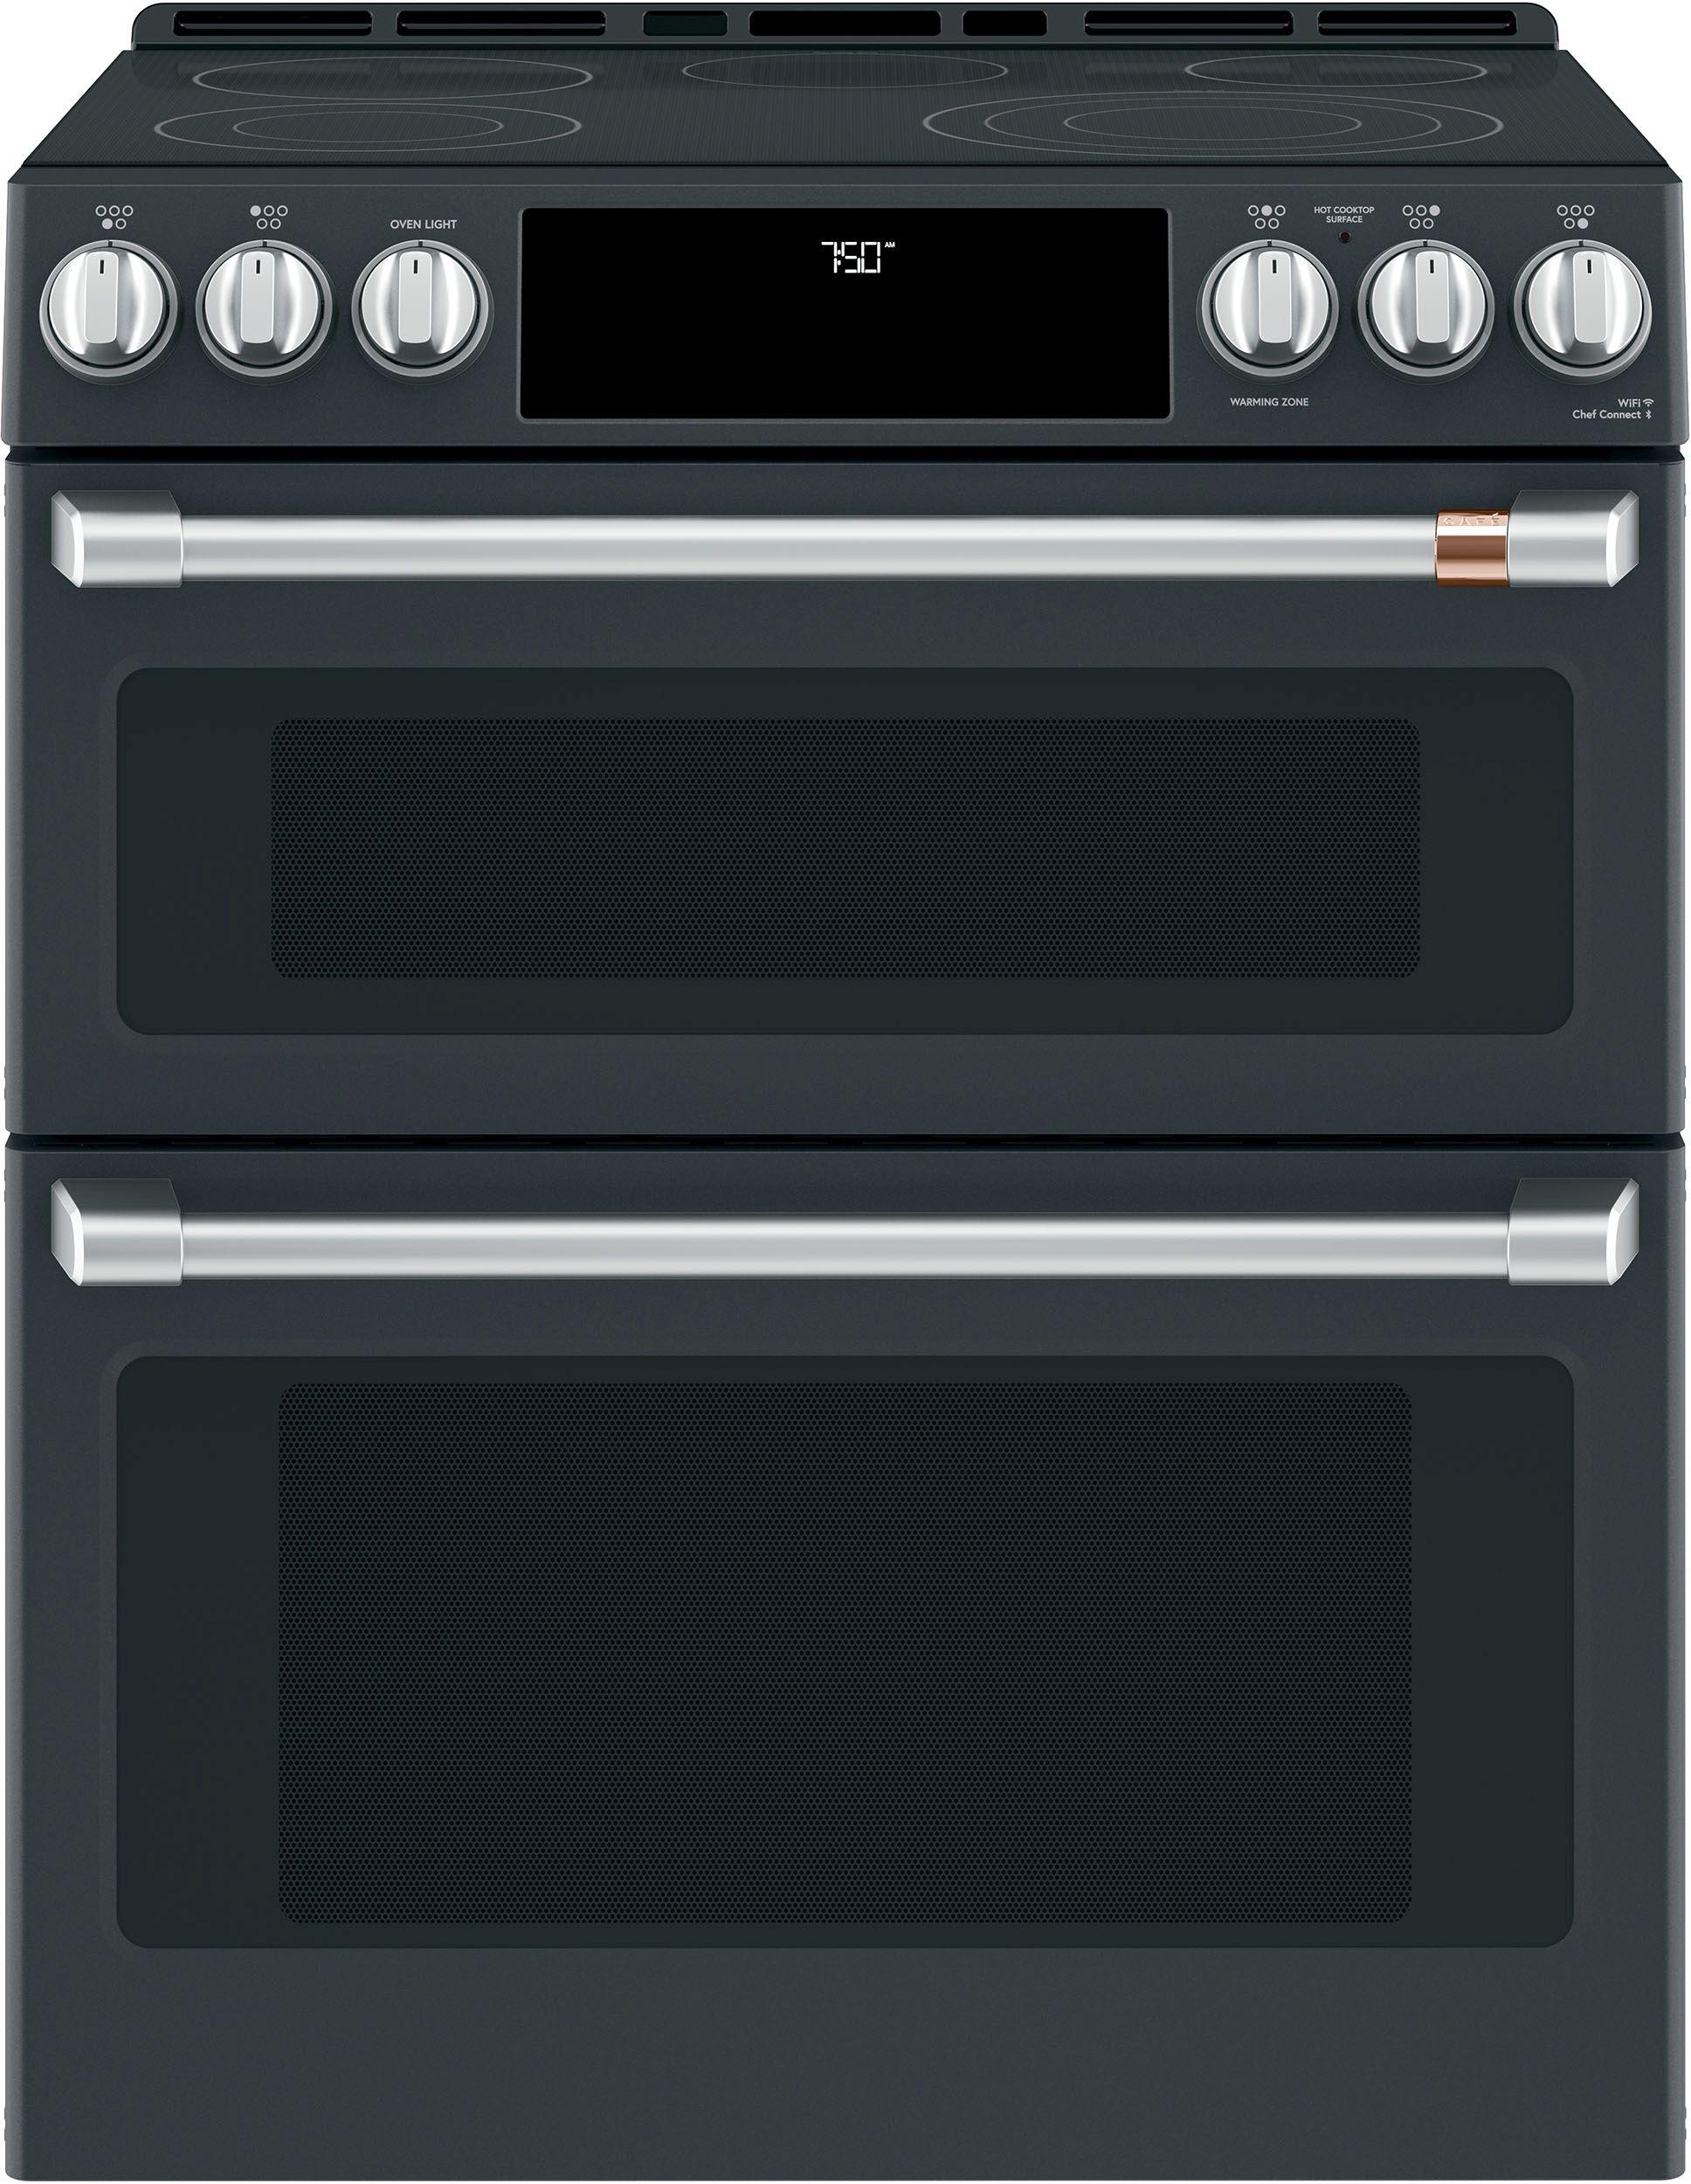 Slide In Electric Range Home Appliances, Kitchen Appliances